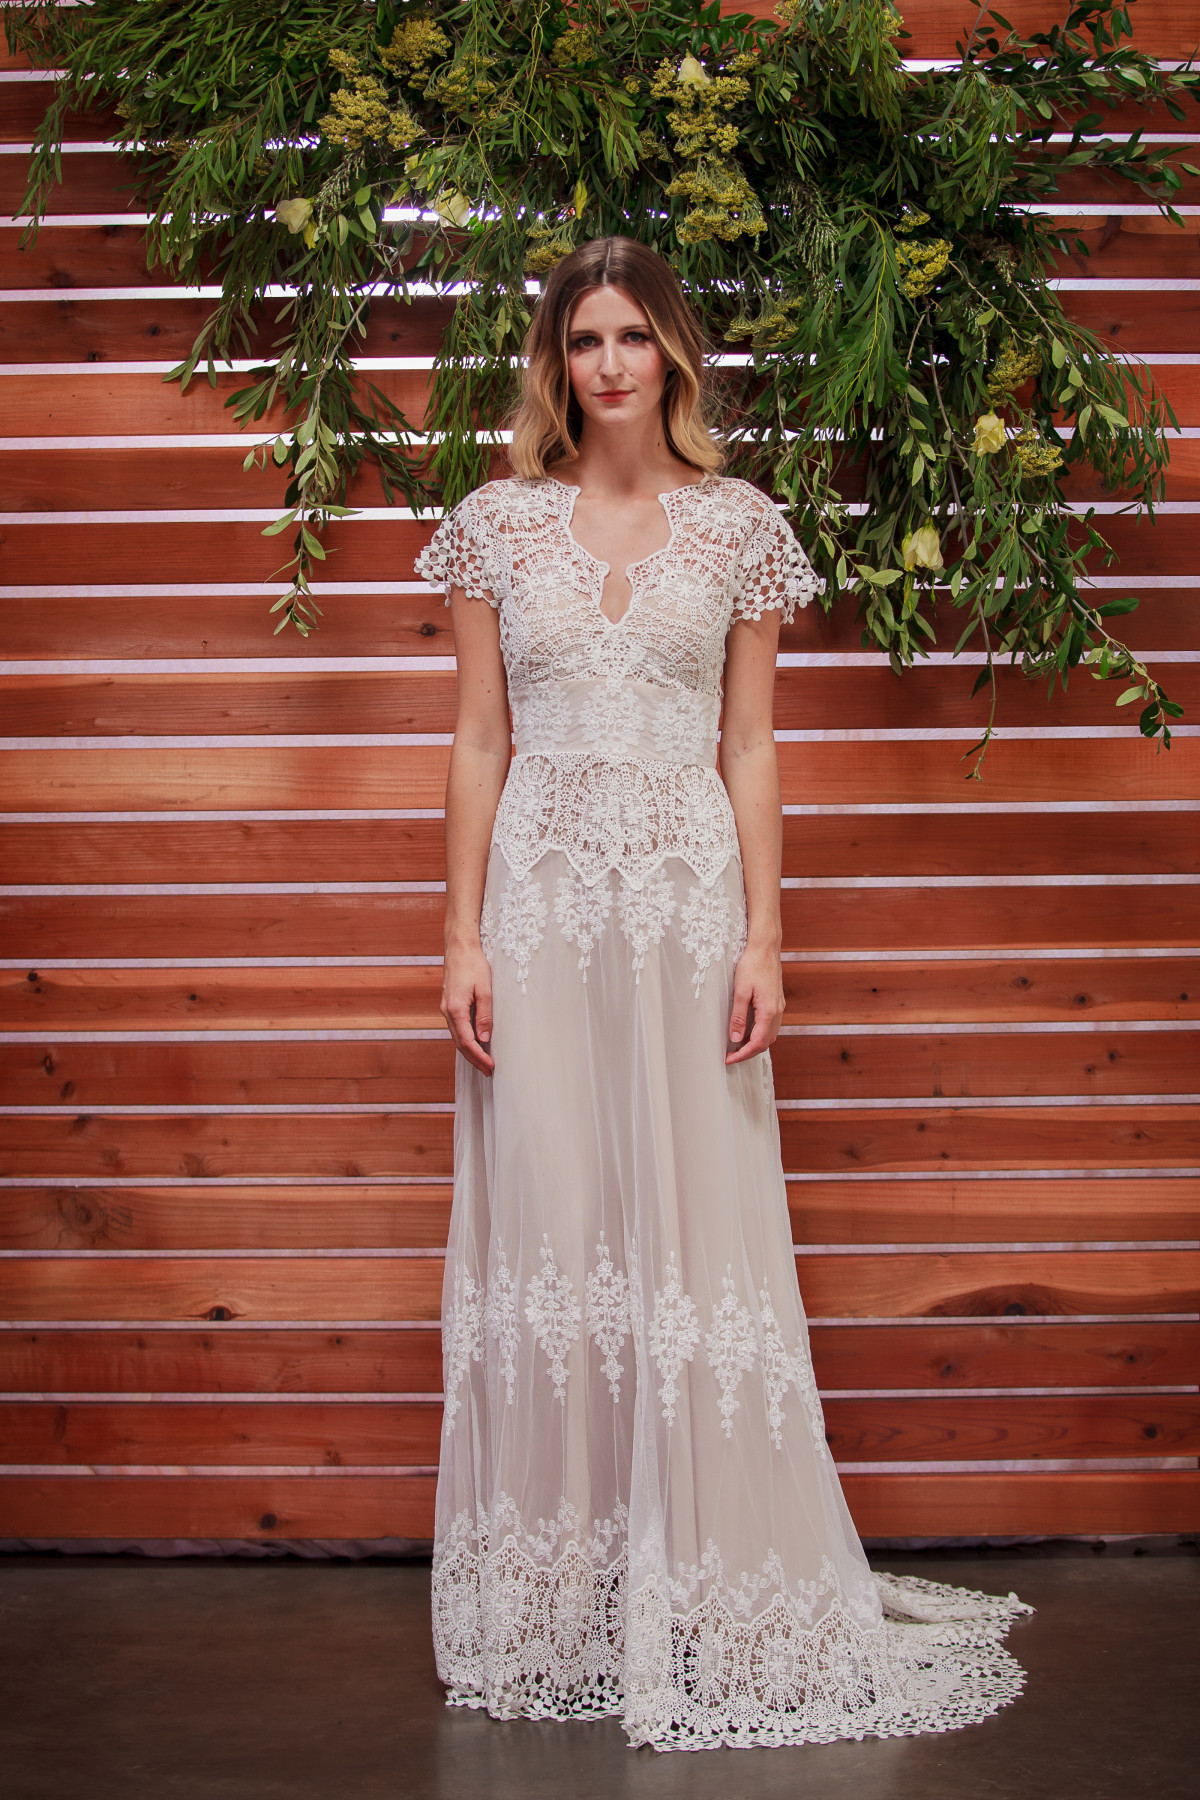 Lace Wedding Gowns  Azalea Boho Cotton Lace Wedding Dress